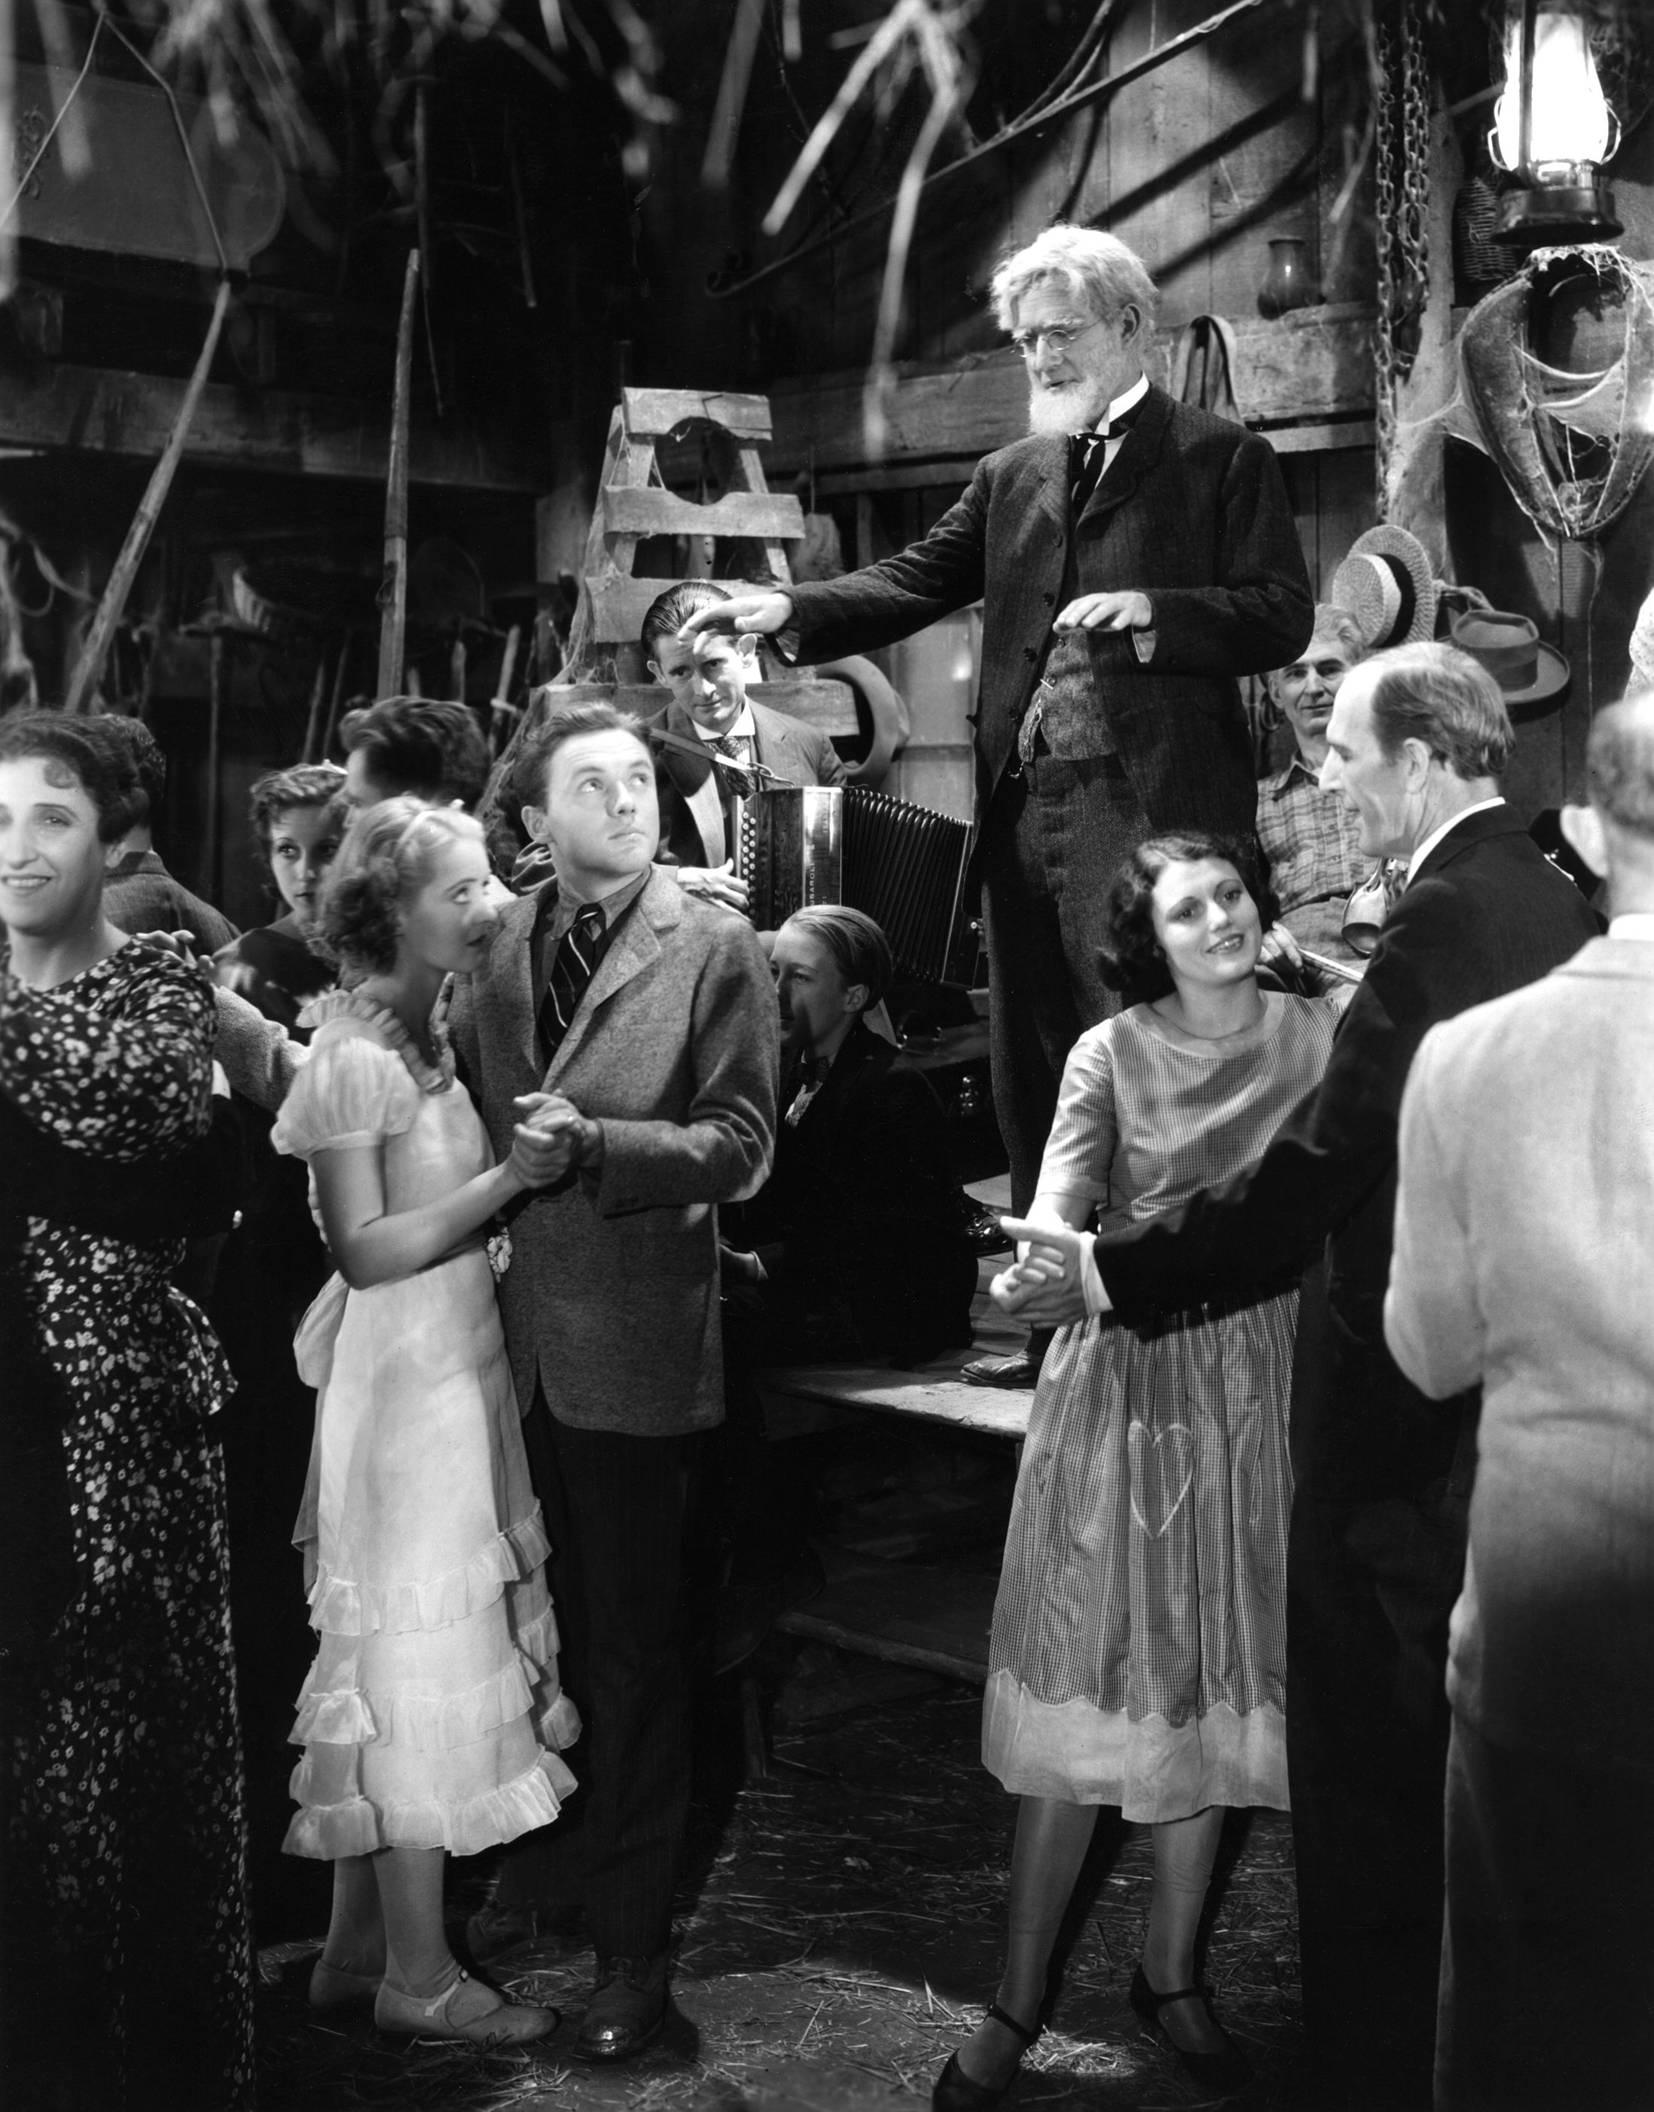 Bette Davis with Frank Albertson